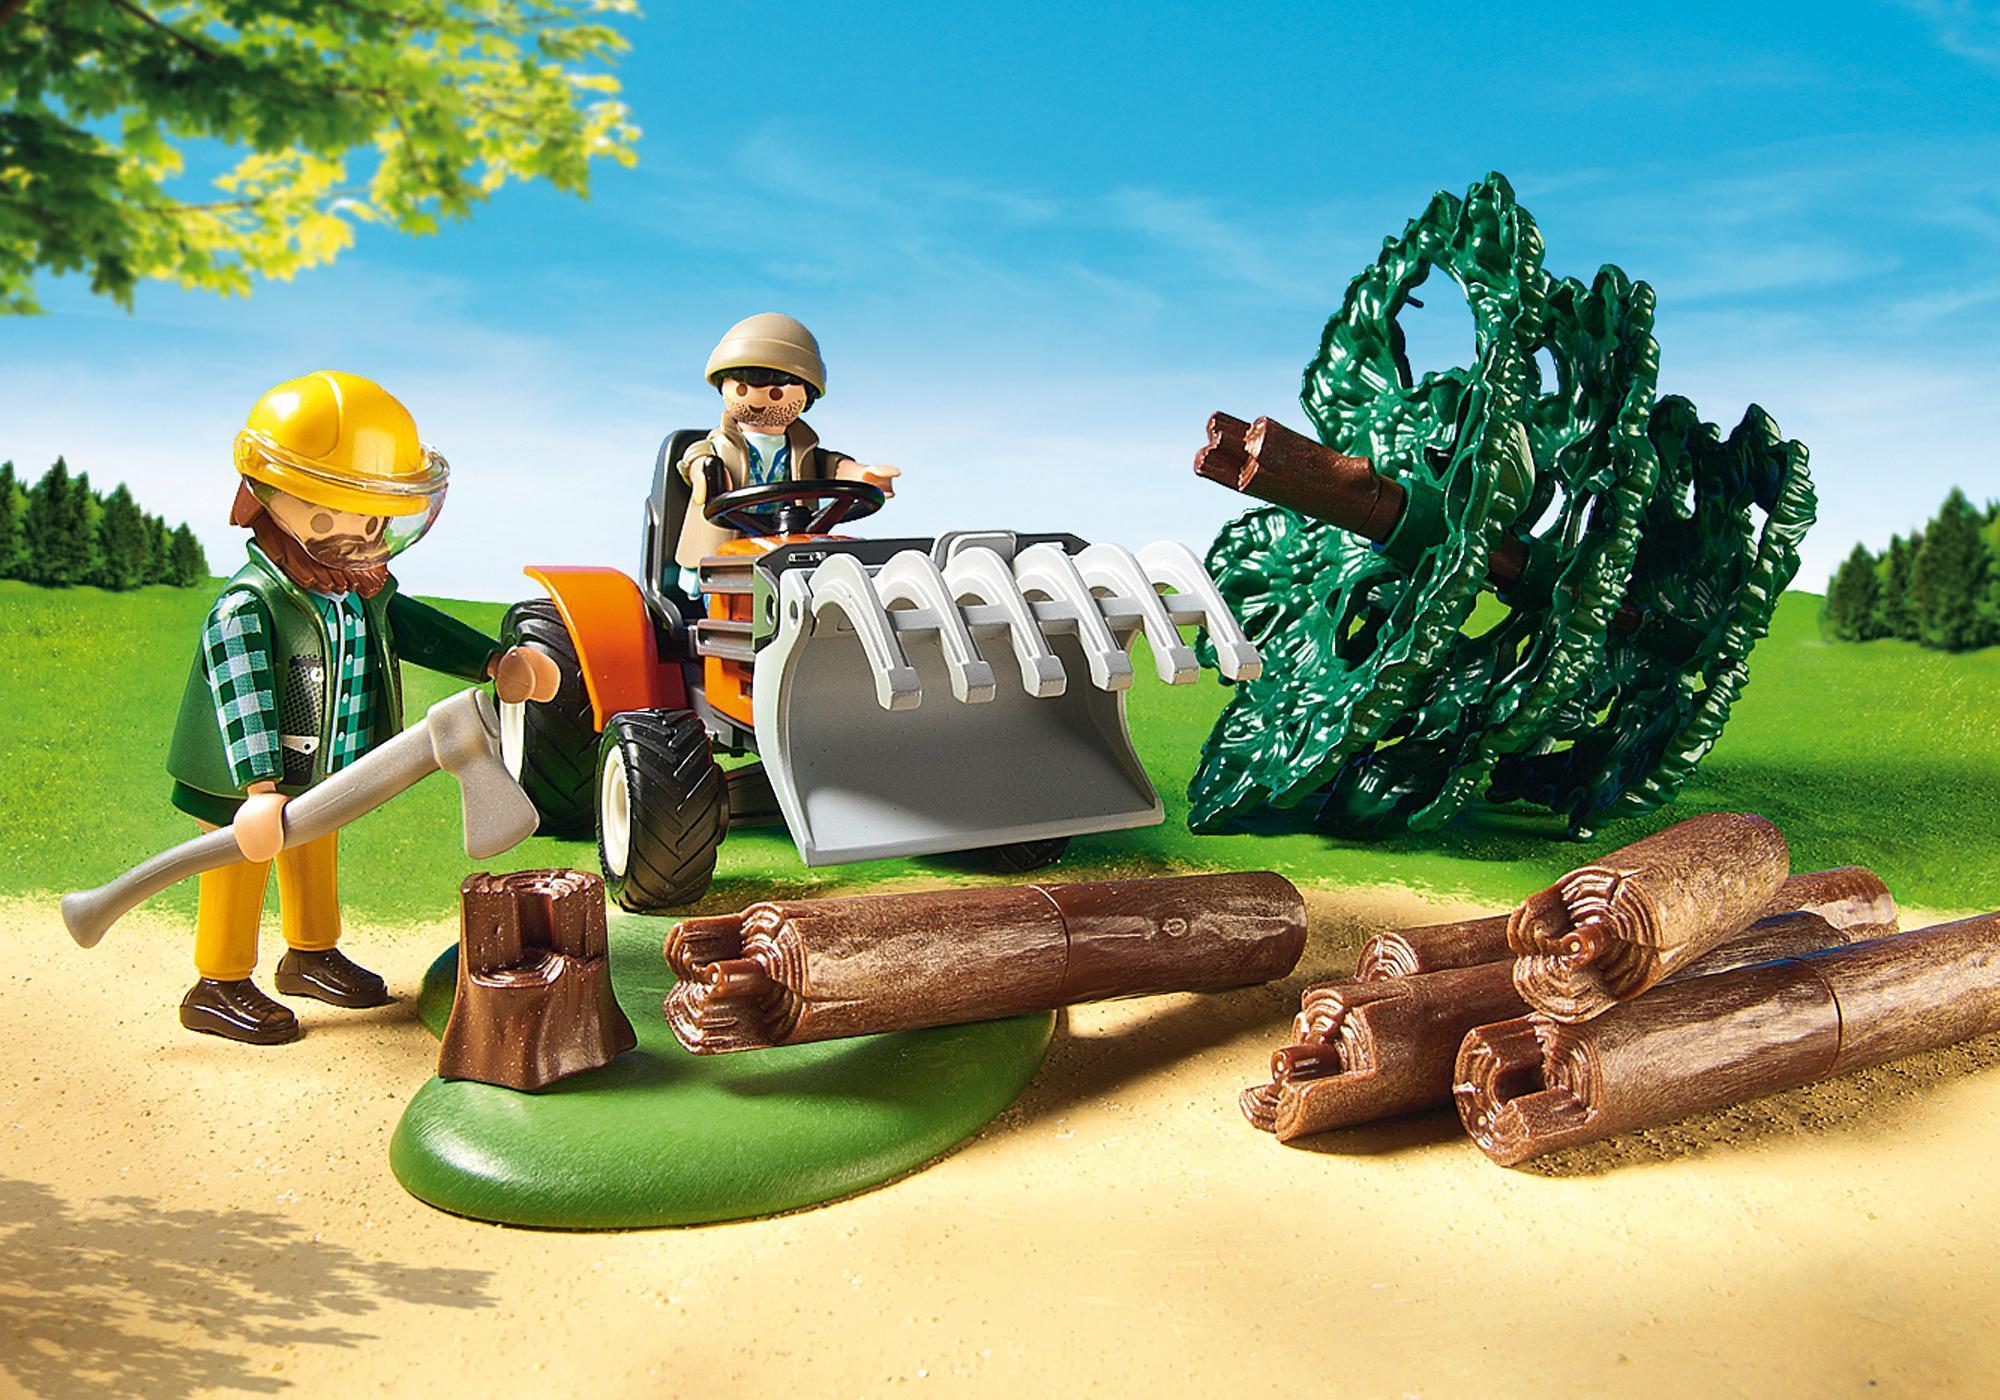 http://media.playmobil.com/i/playmobil/6814_product_extra2/Houthakker met tractor